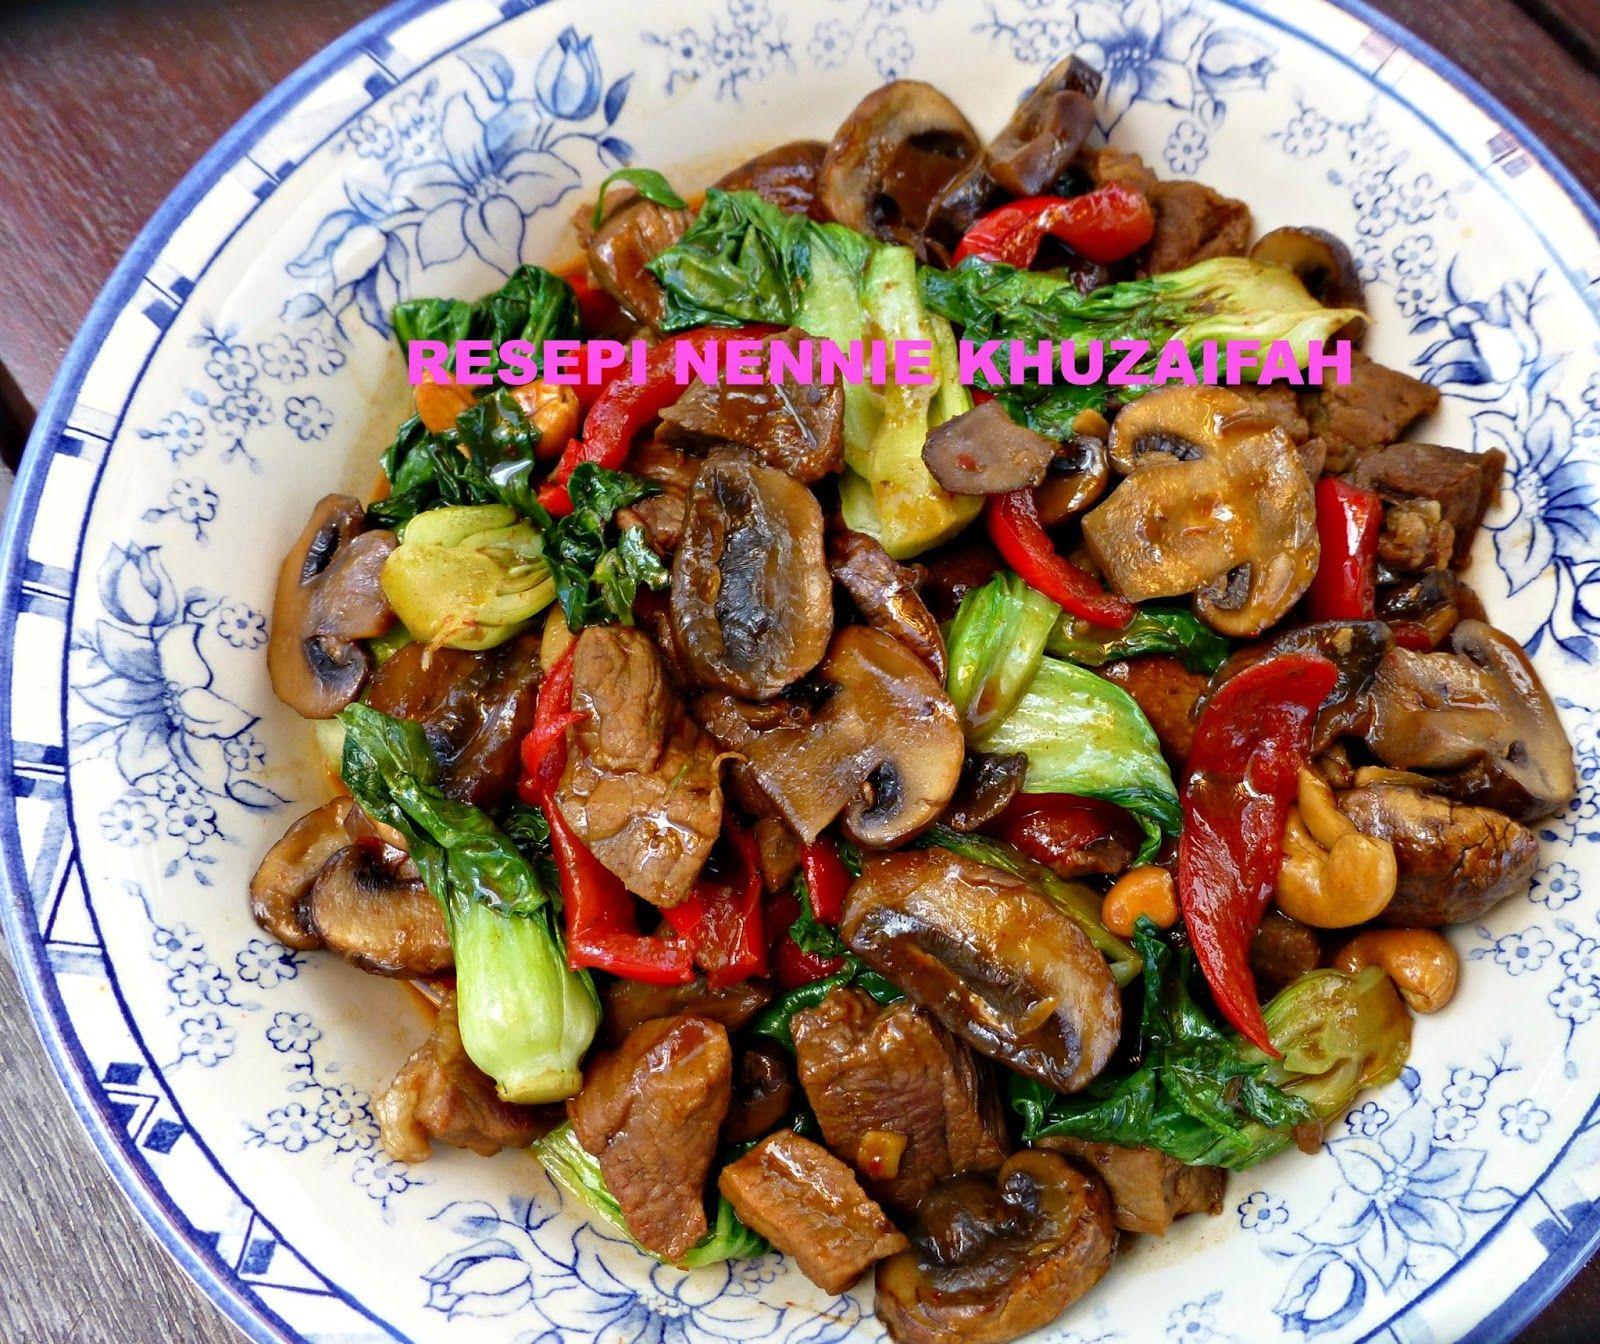 resipi sayur campur chinese style resepi bergambar Resepi Sup Sayur Masam Enak dan Mudah